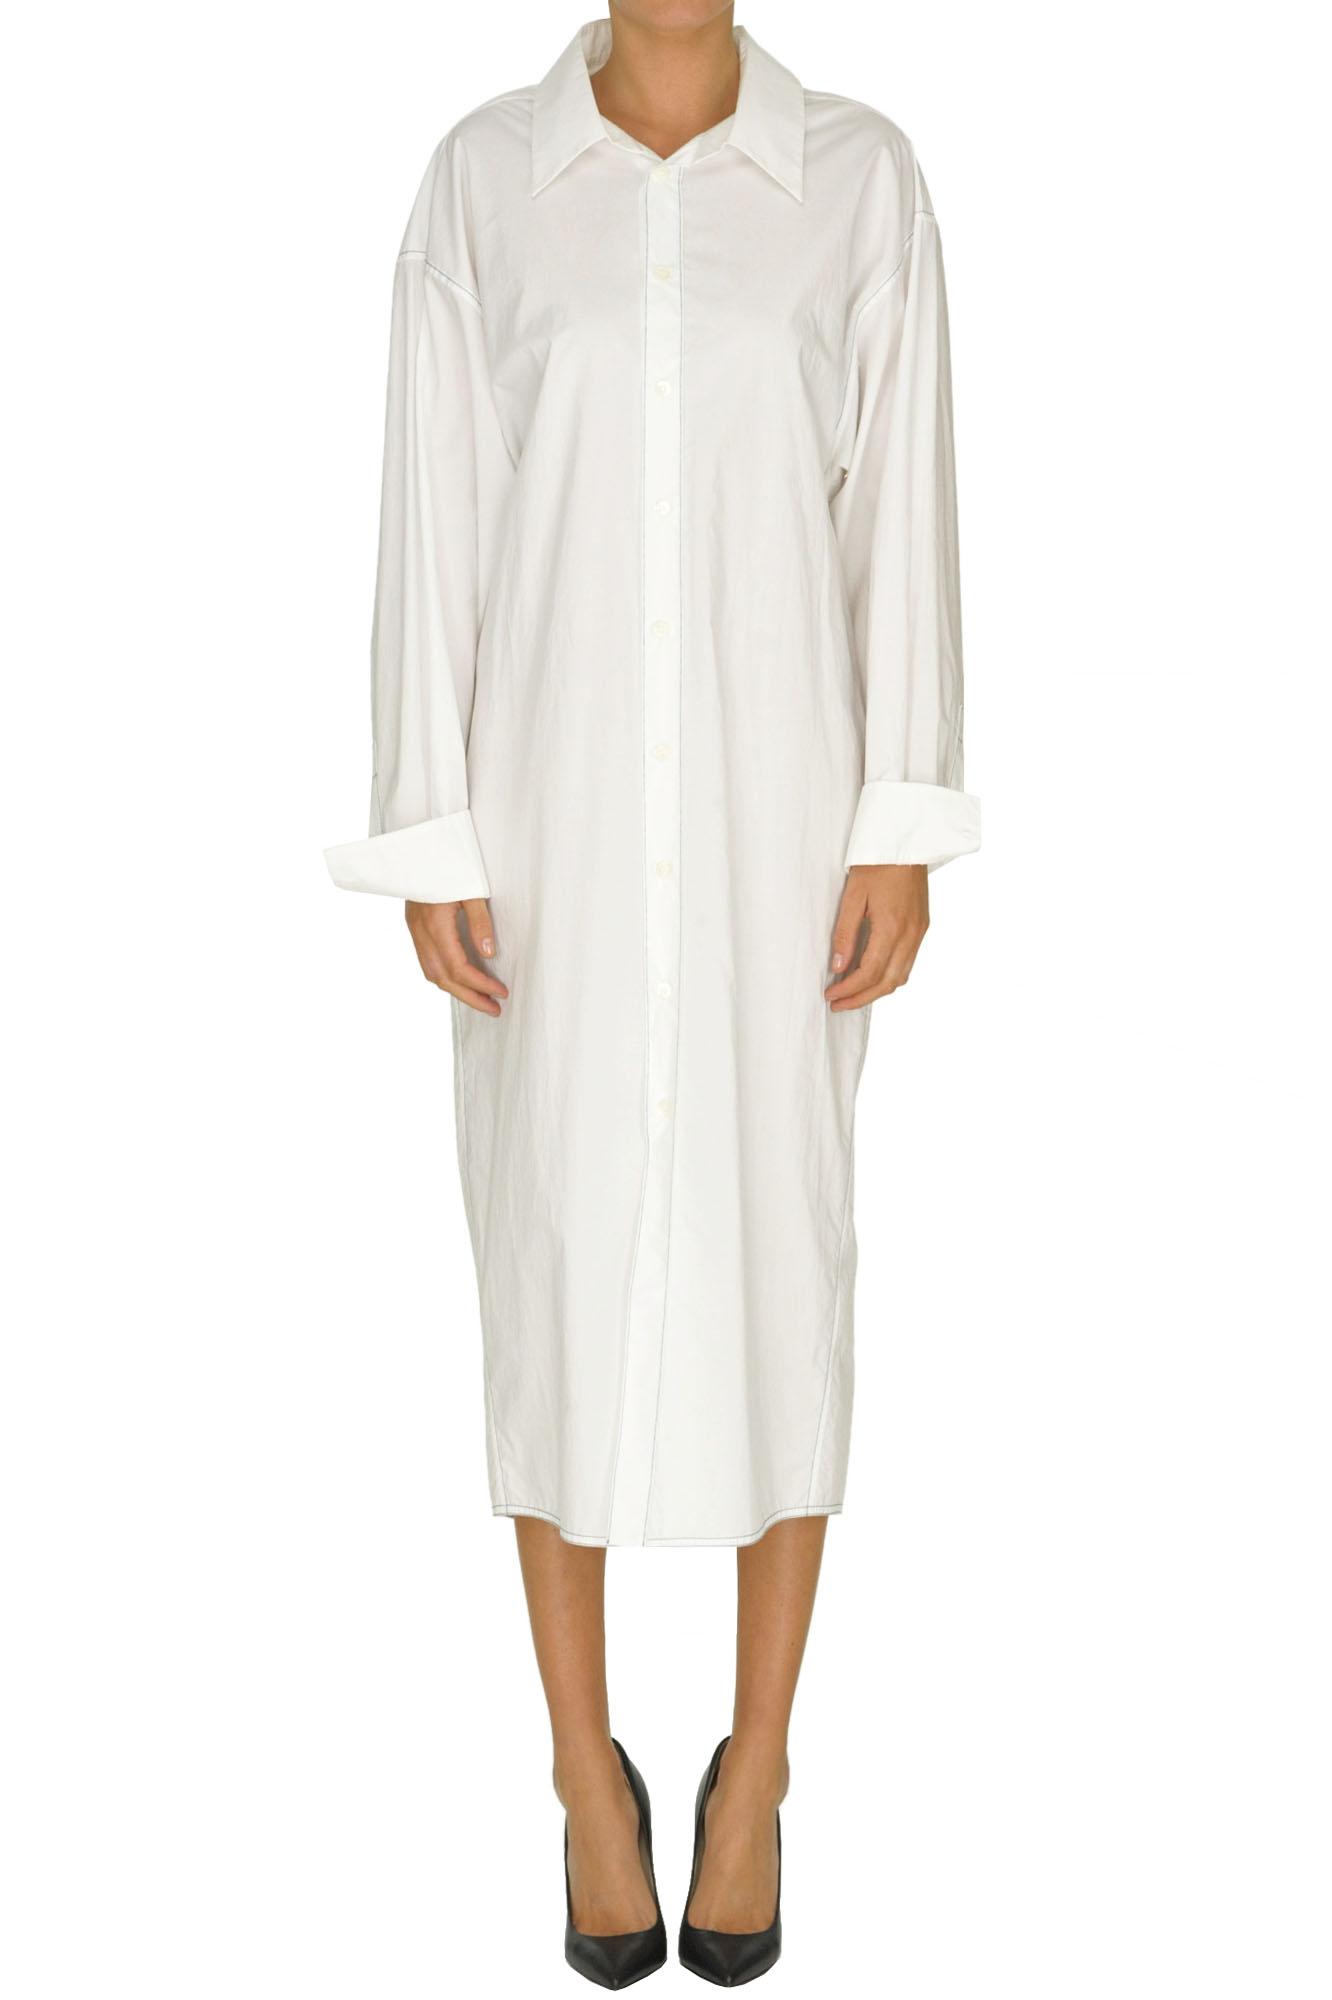 c6ff71842b Marni Oversized Shirt Dress In White